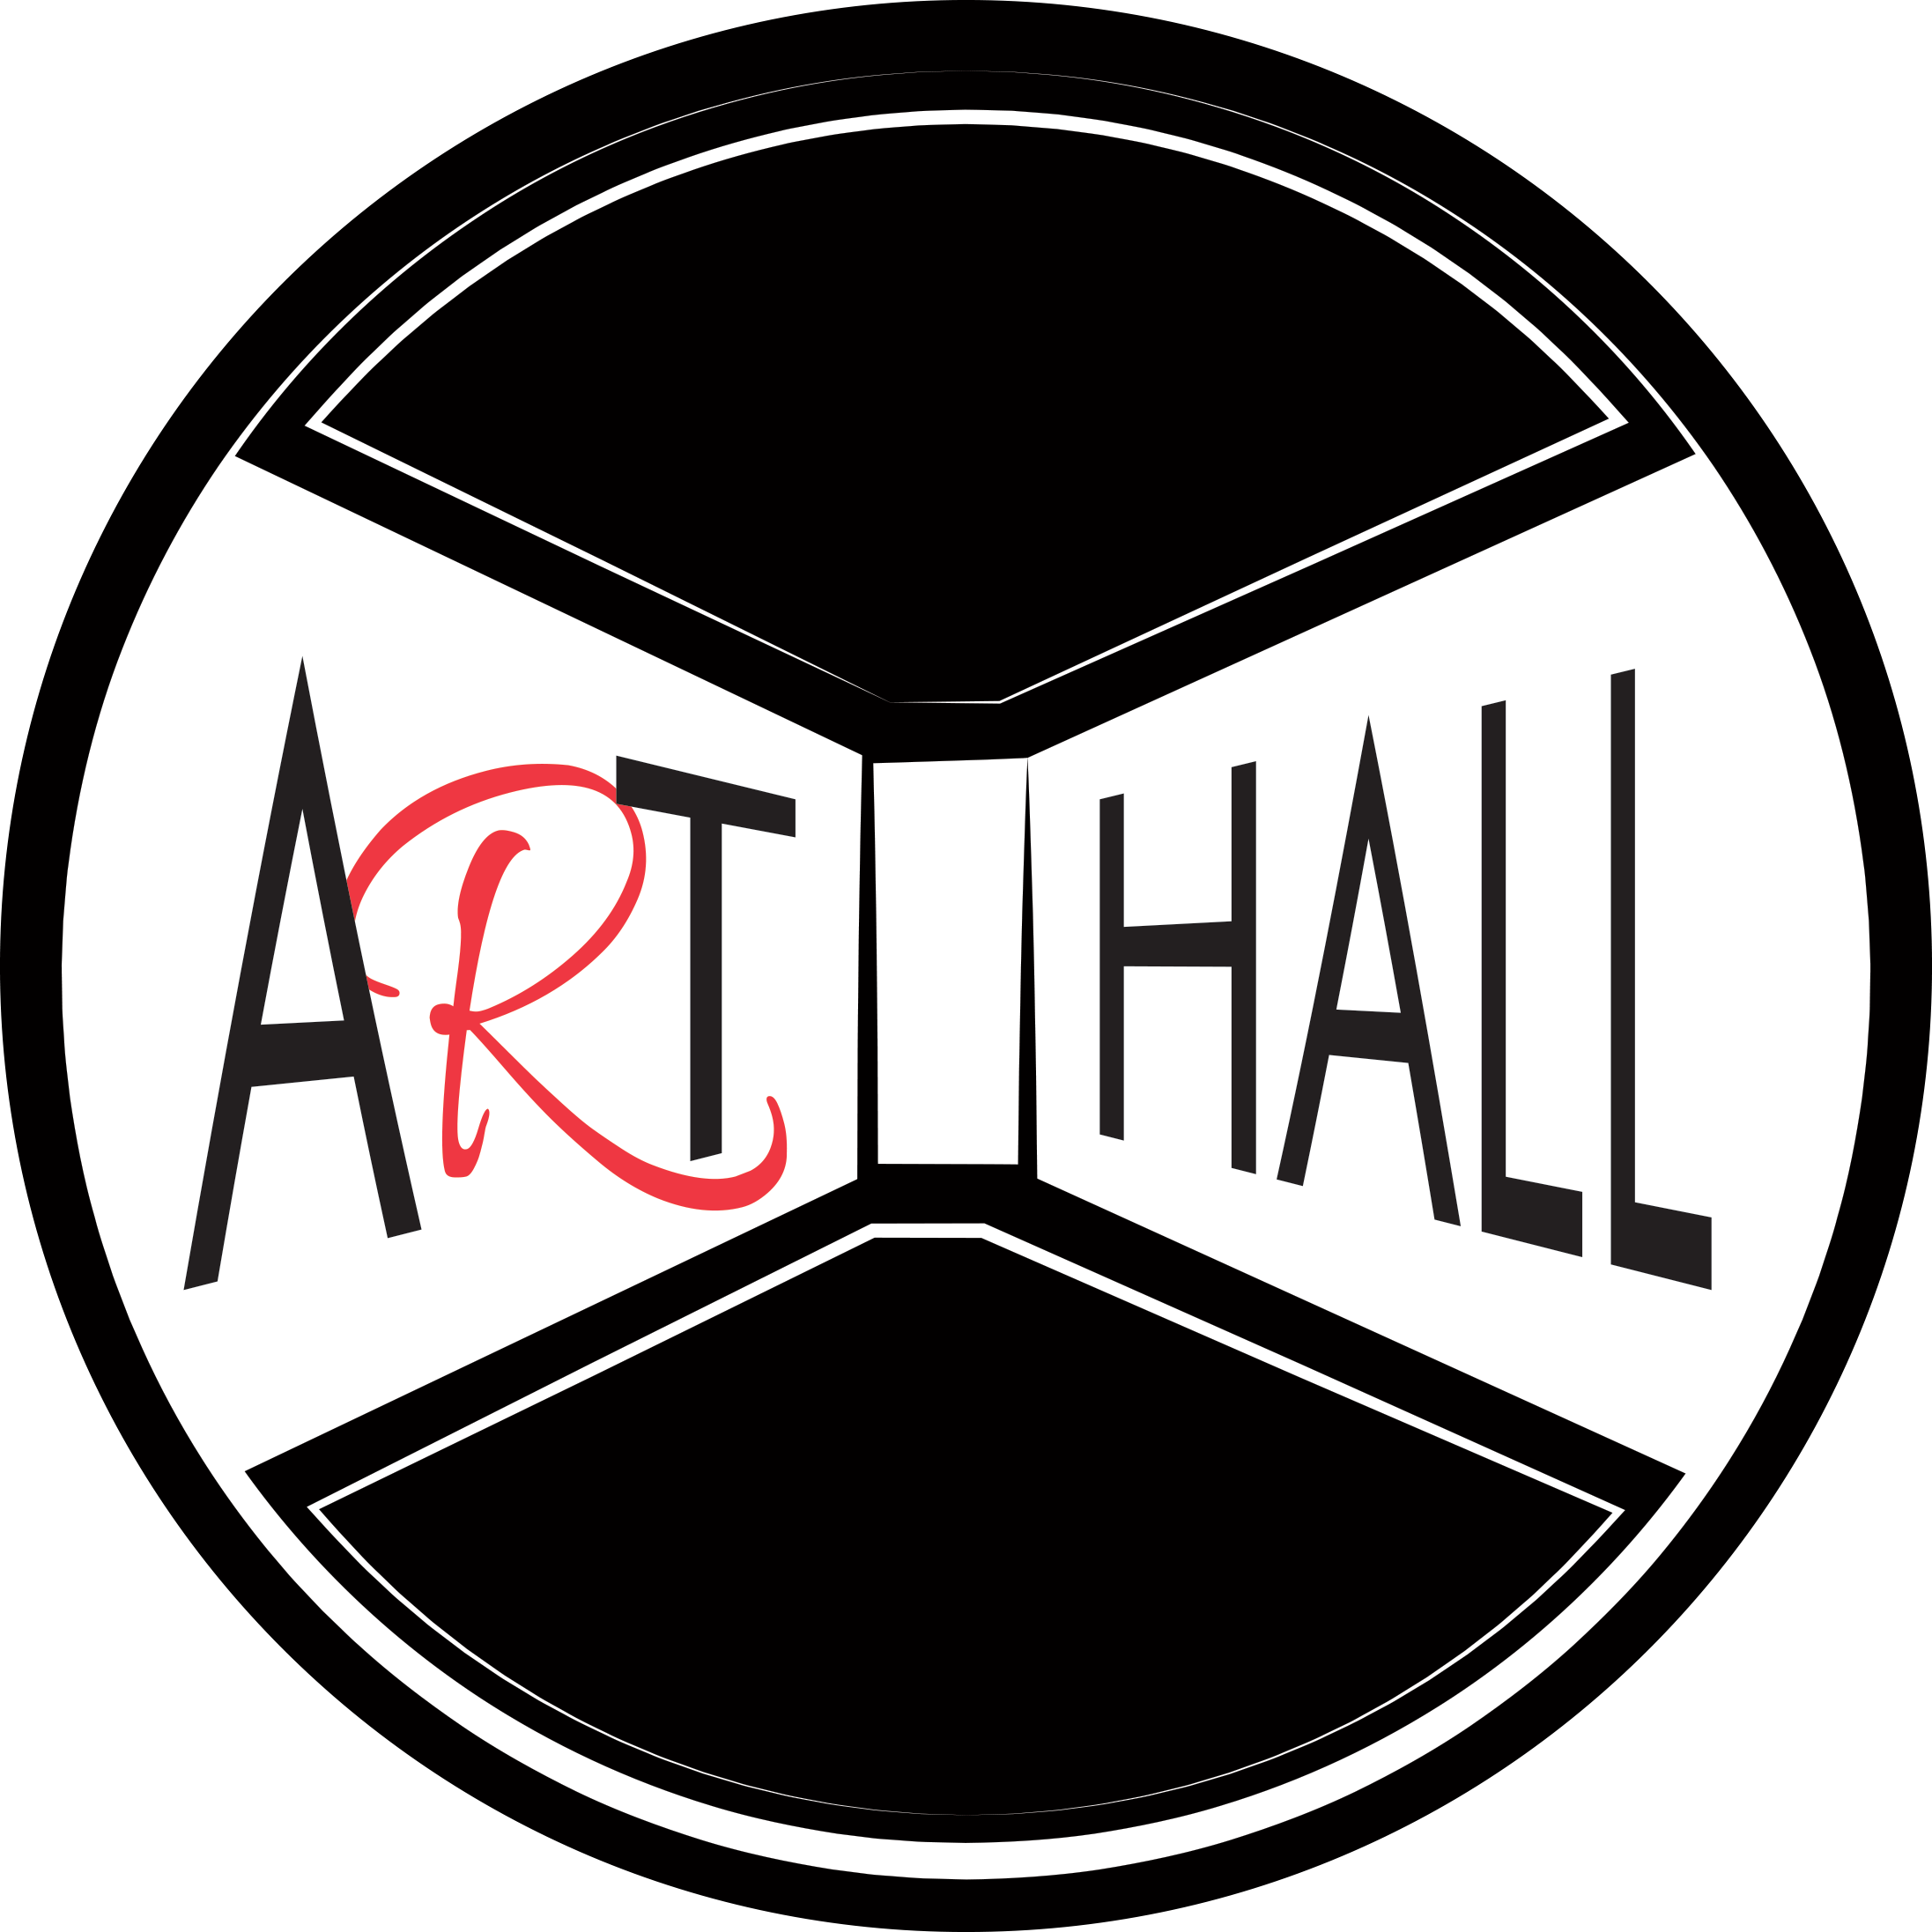 The Art Hall